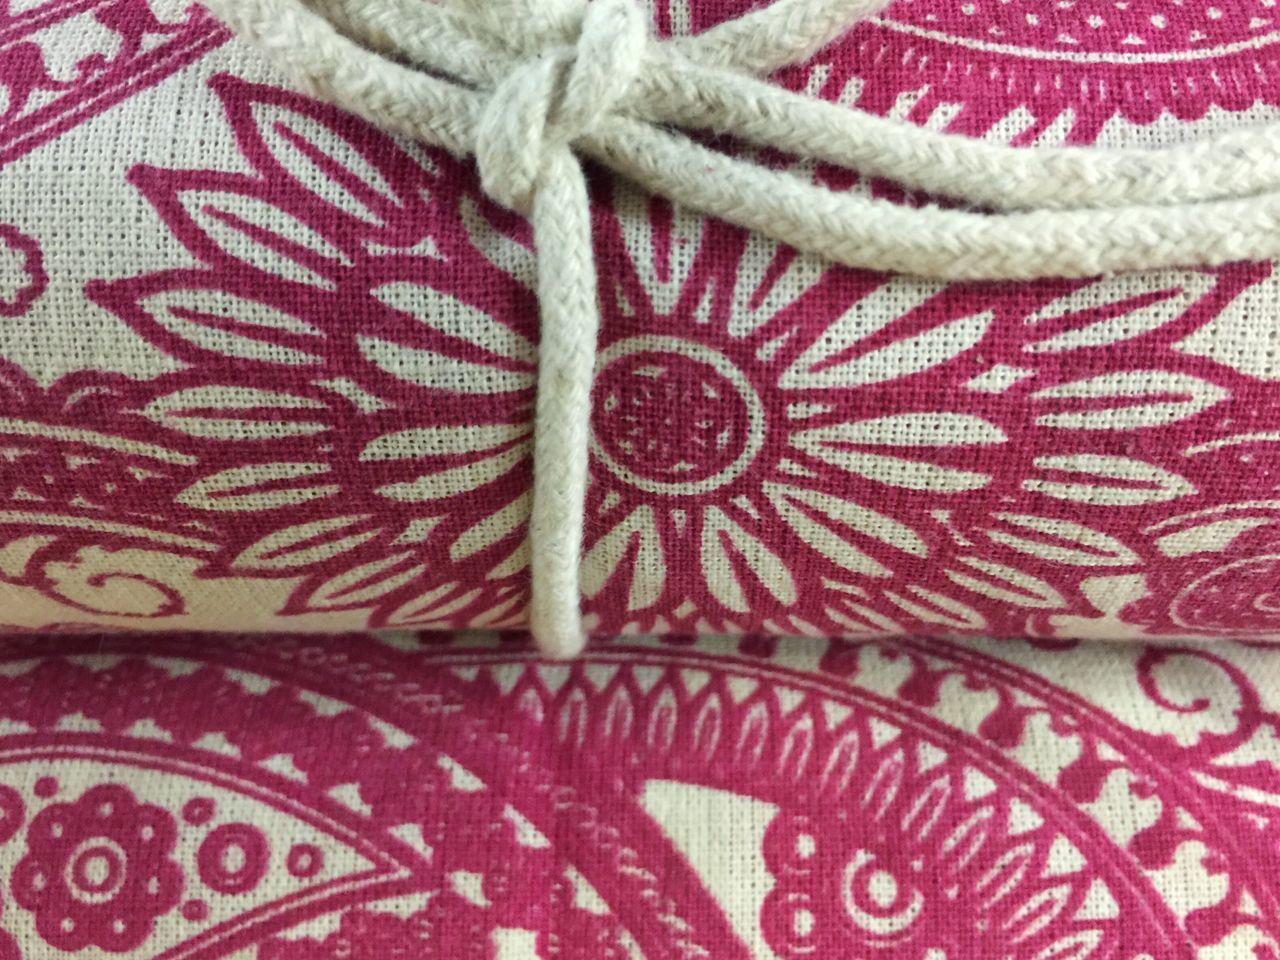 Pastel Power Rolled fabric Fabric Fabric Detail Textiles Linen Texture Design Linens Linen Textile Colorful Design Burgandy Market Bestsellers June 2016 Bestsellers